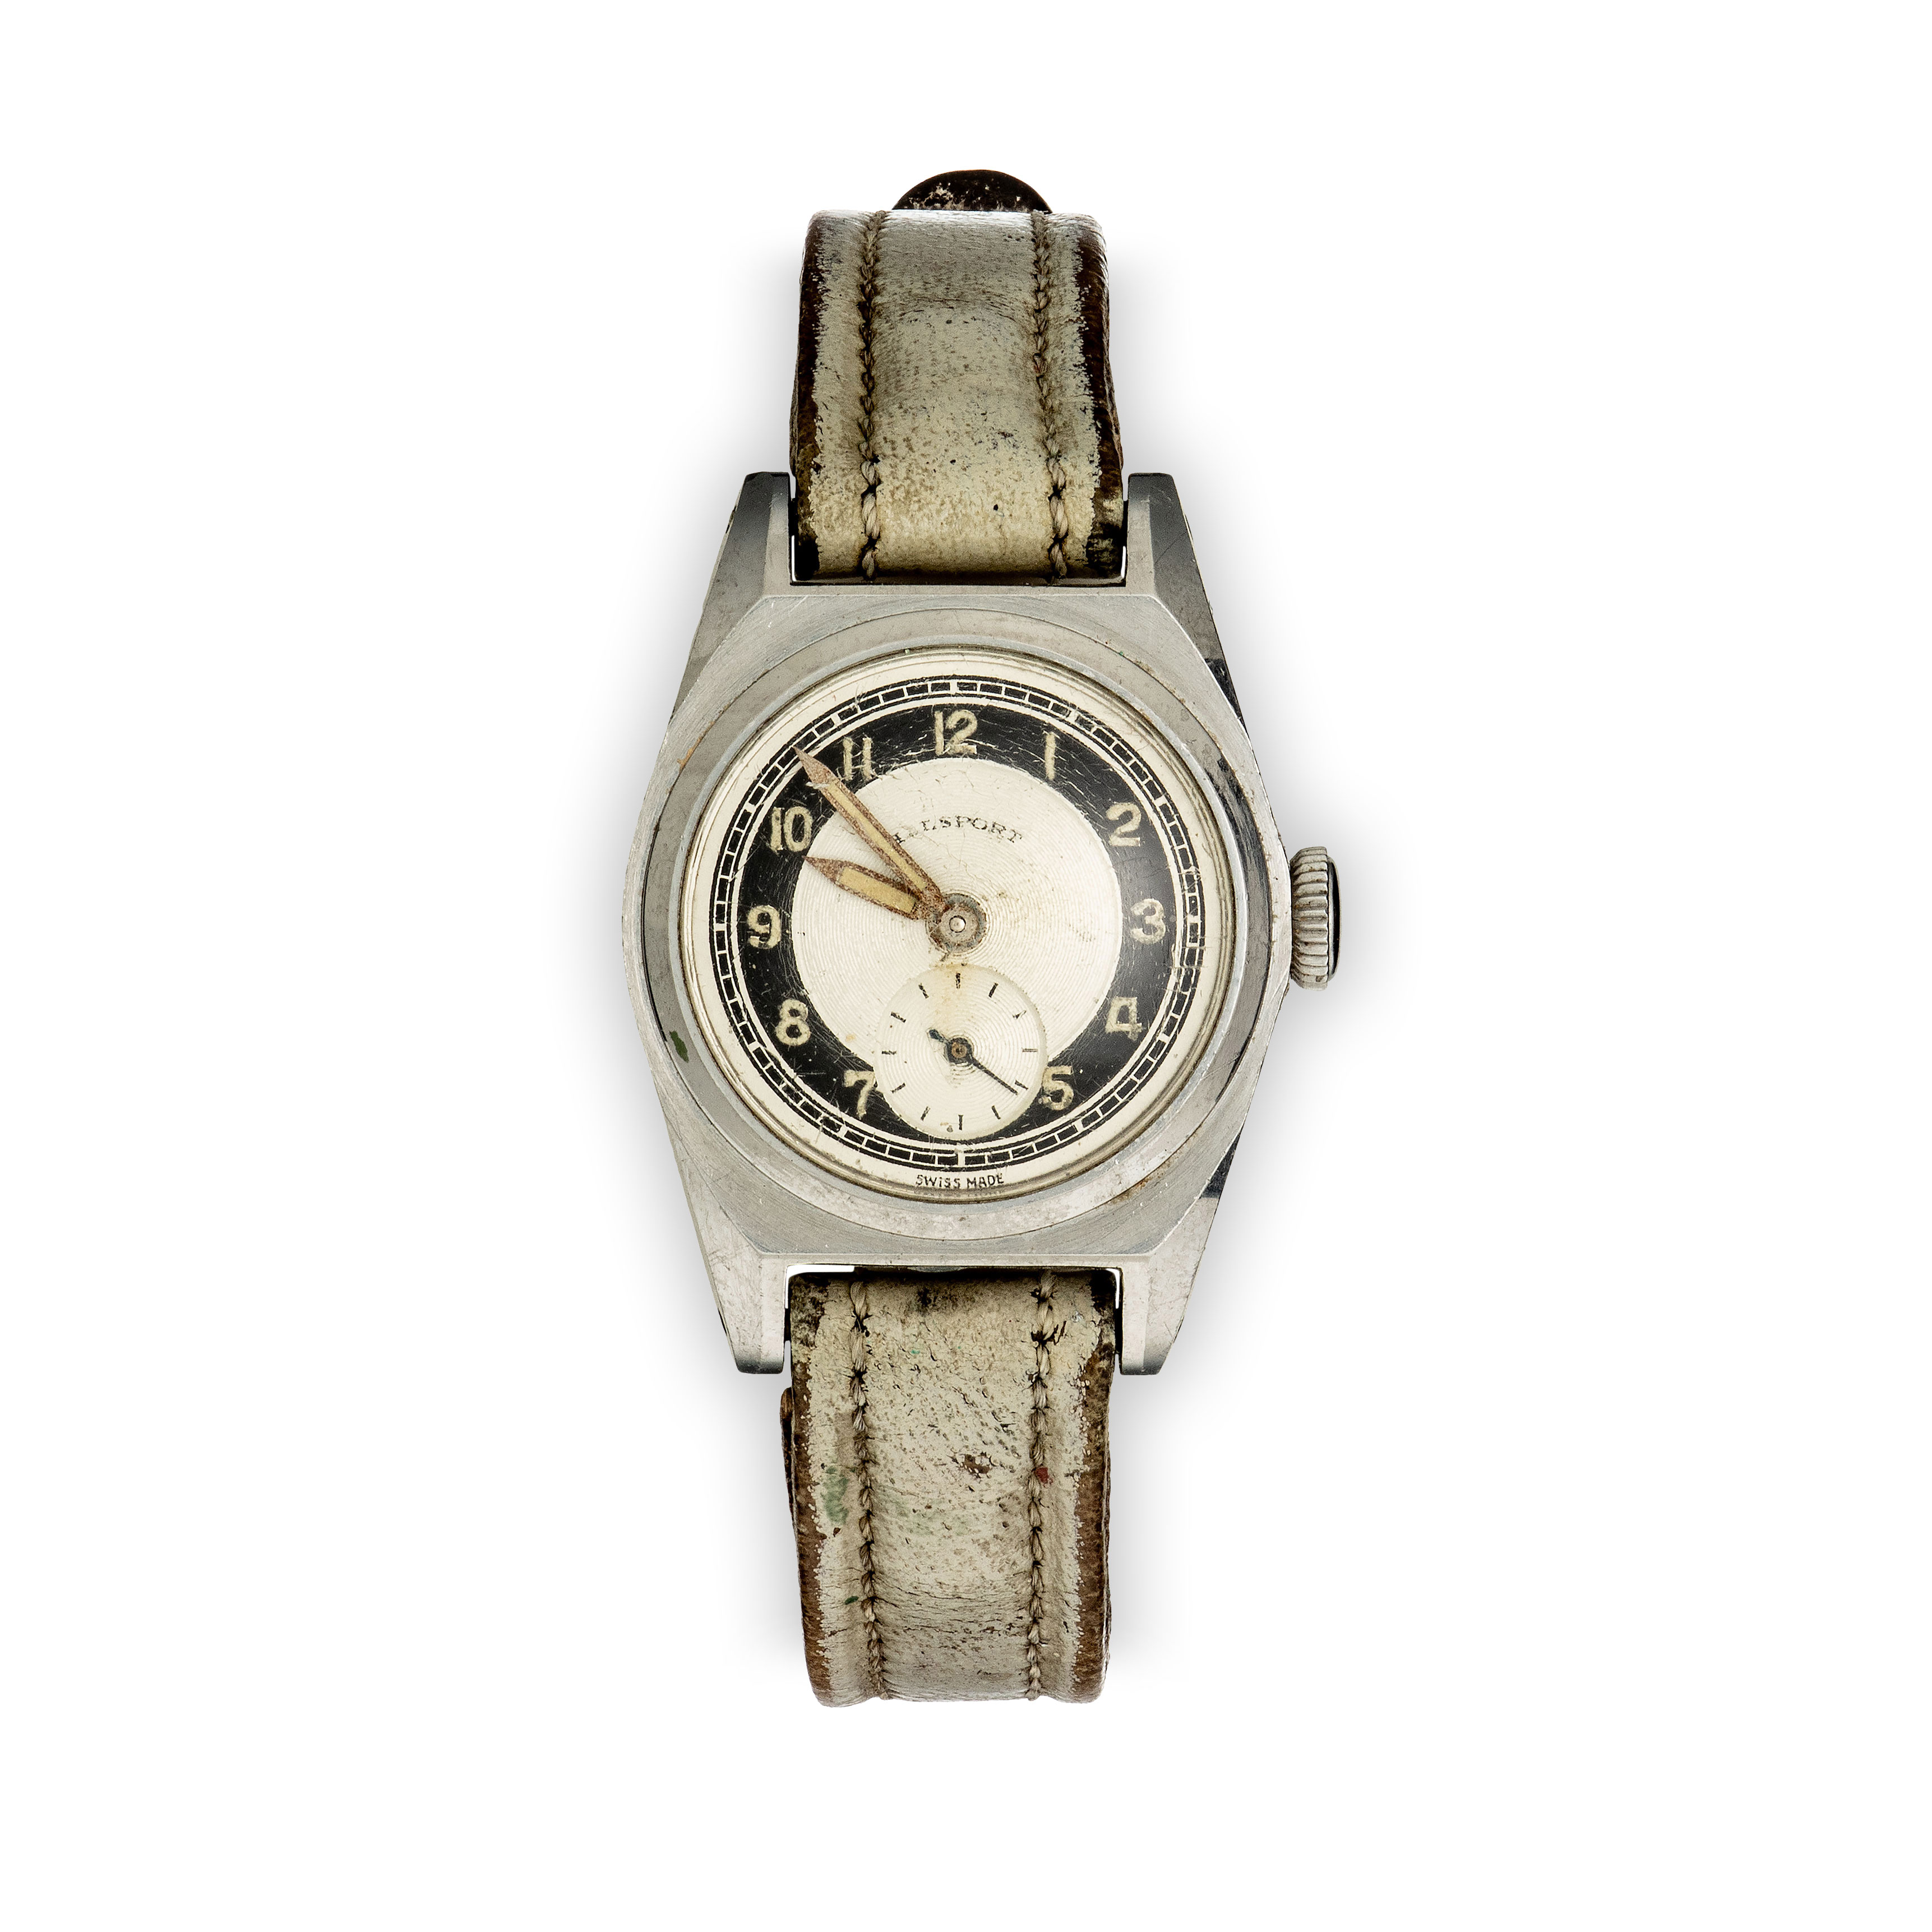 Revue-Sport armbåndsur, manuell opptrekk